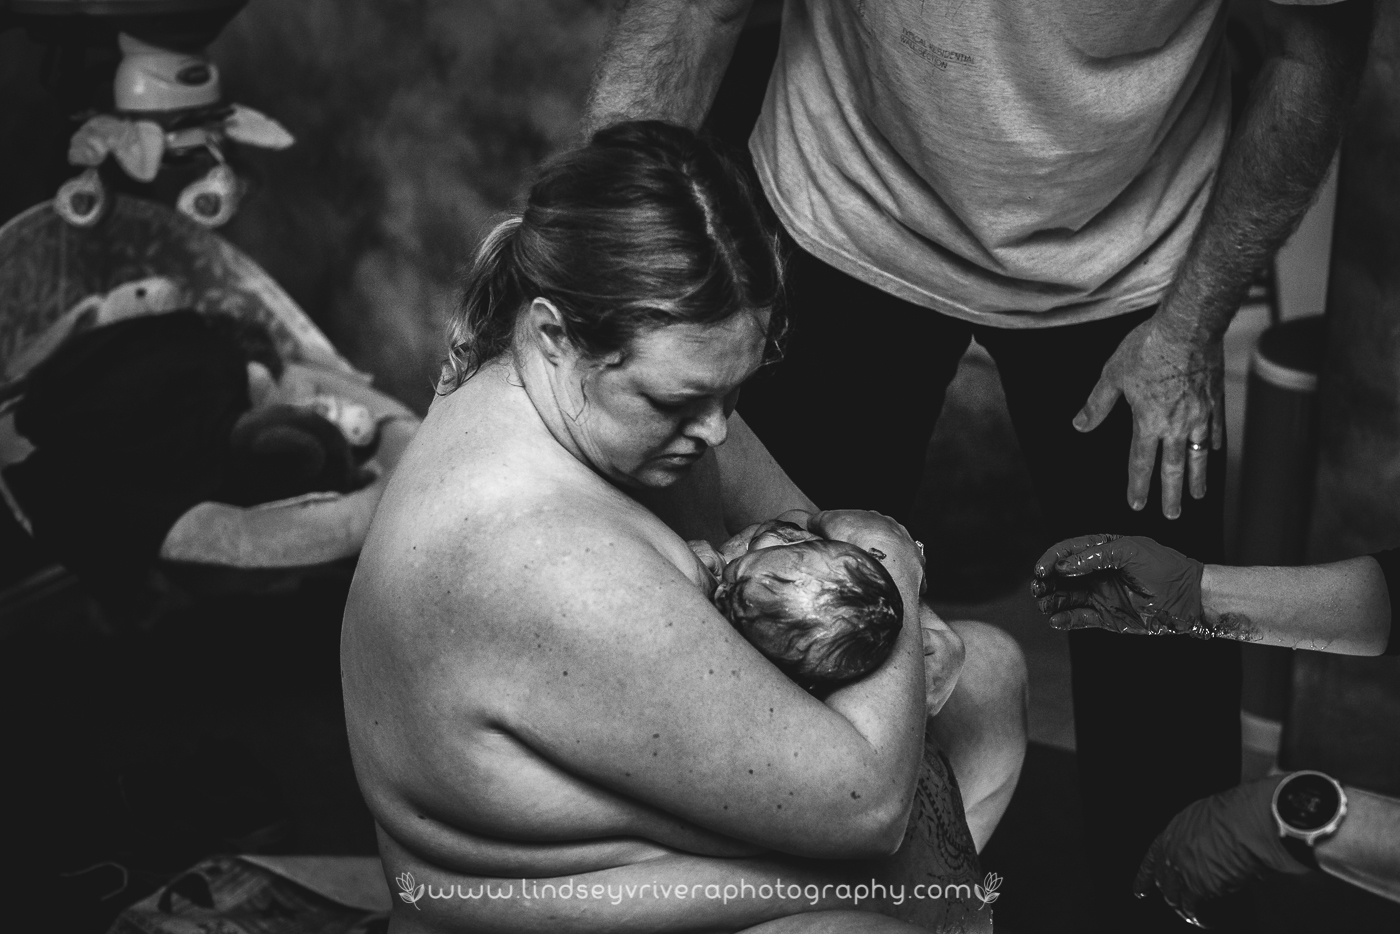 Home-Birth-Born-Photography-Salt-Lake-City,-Wasatch-Midwifery-&-Wellness,-Just-Born16.jpg